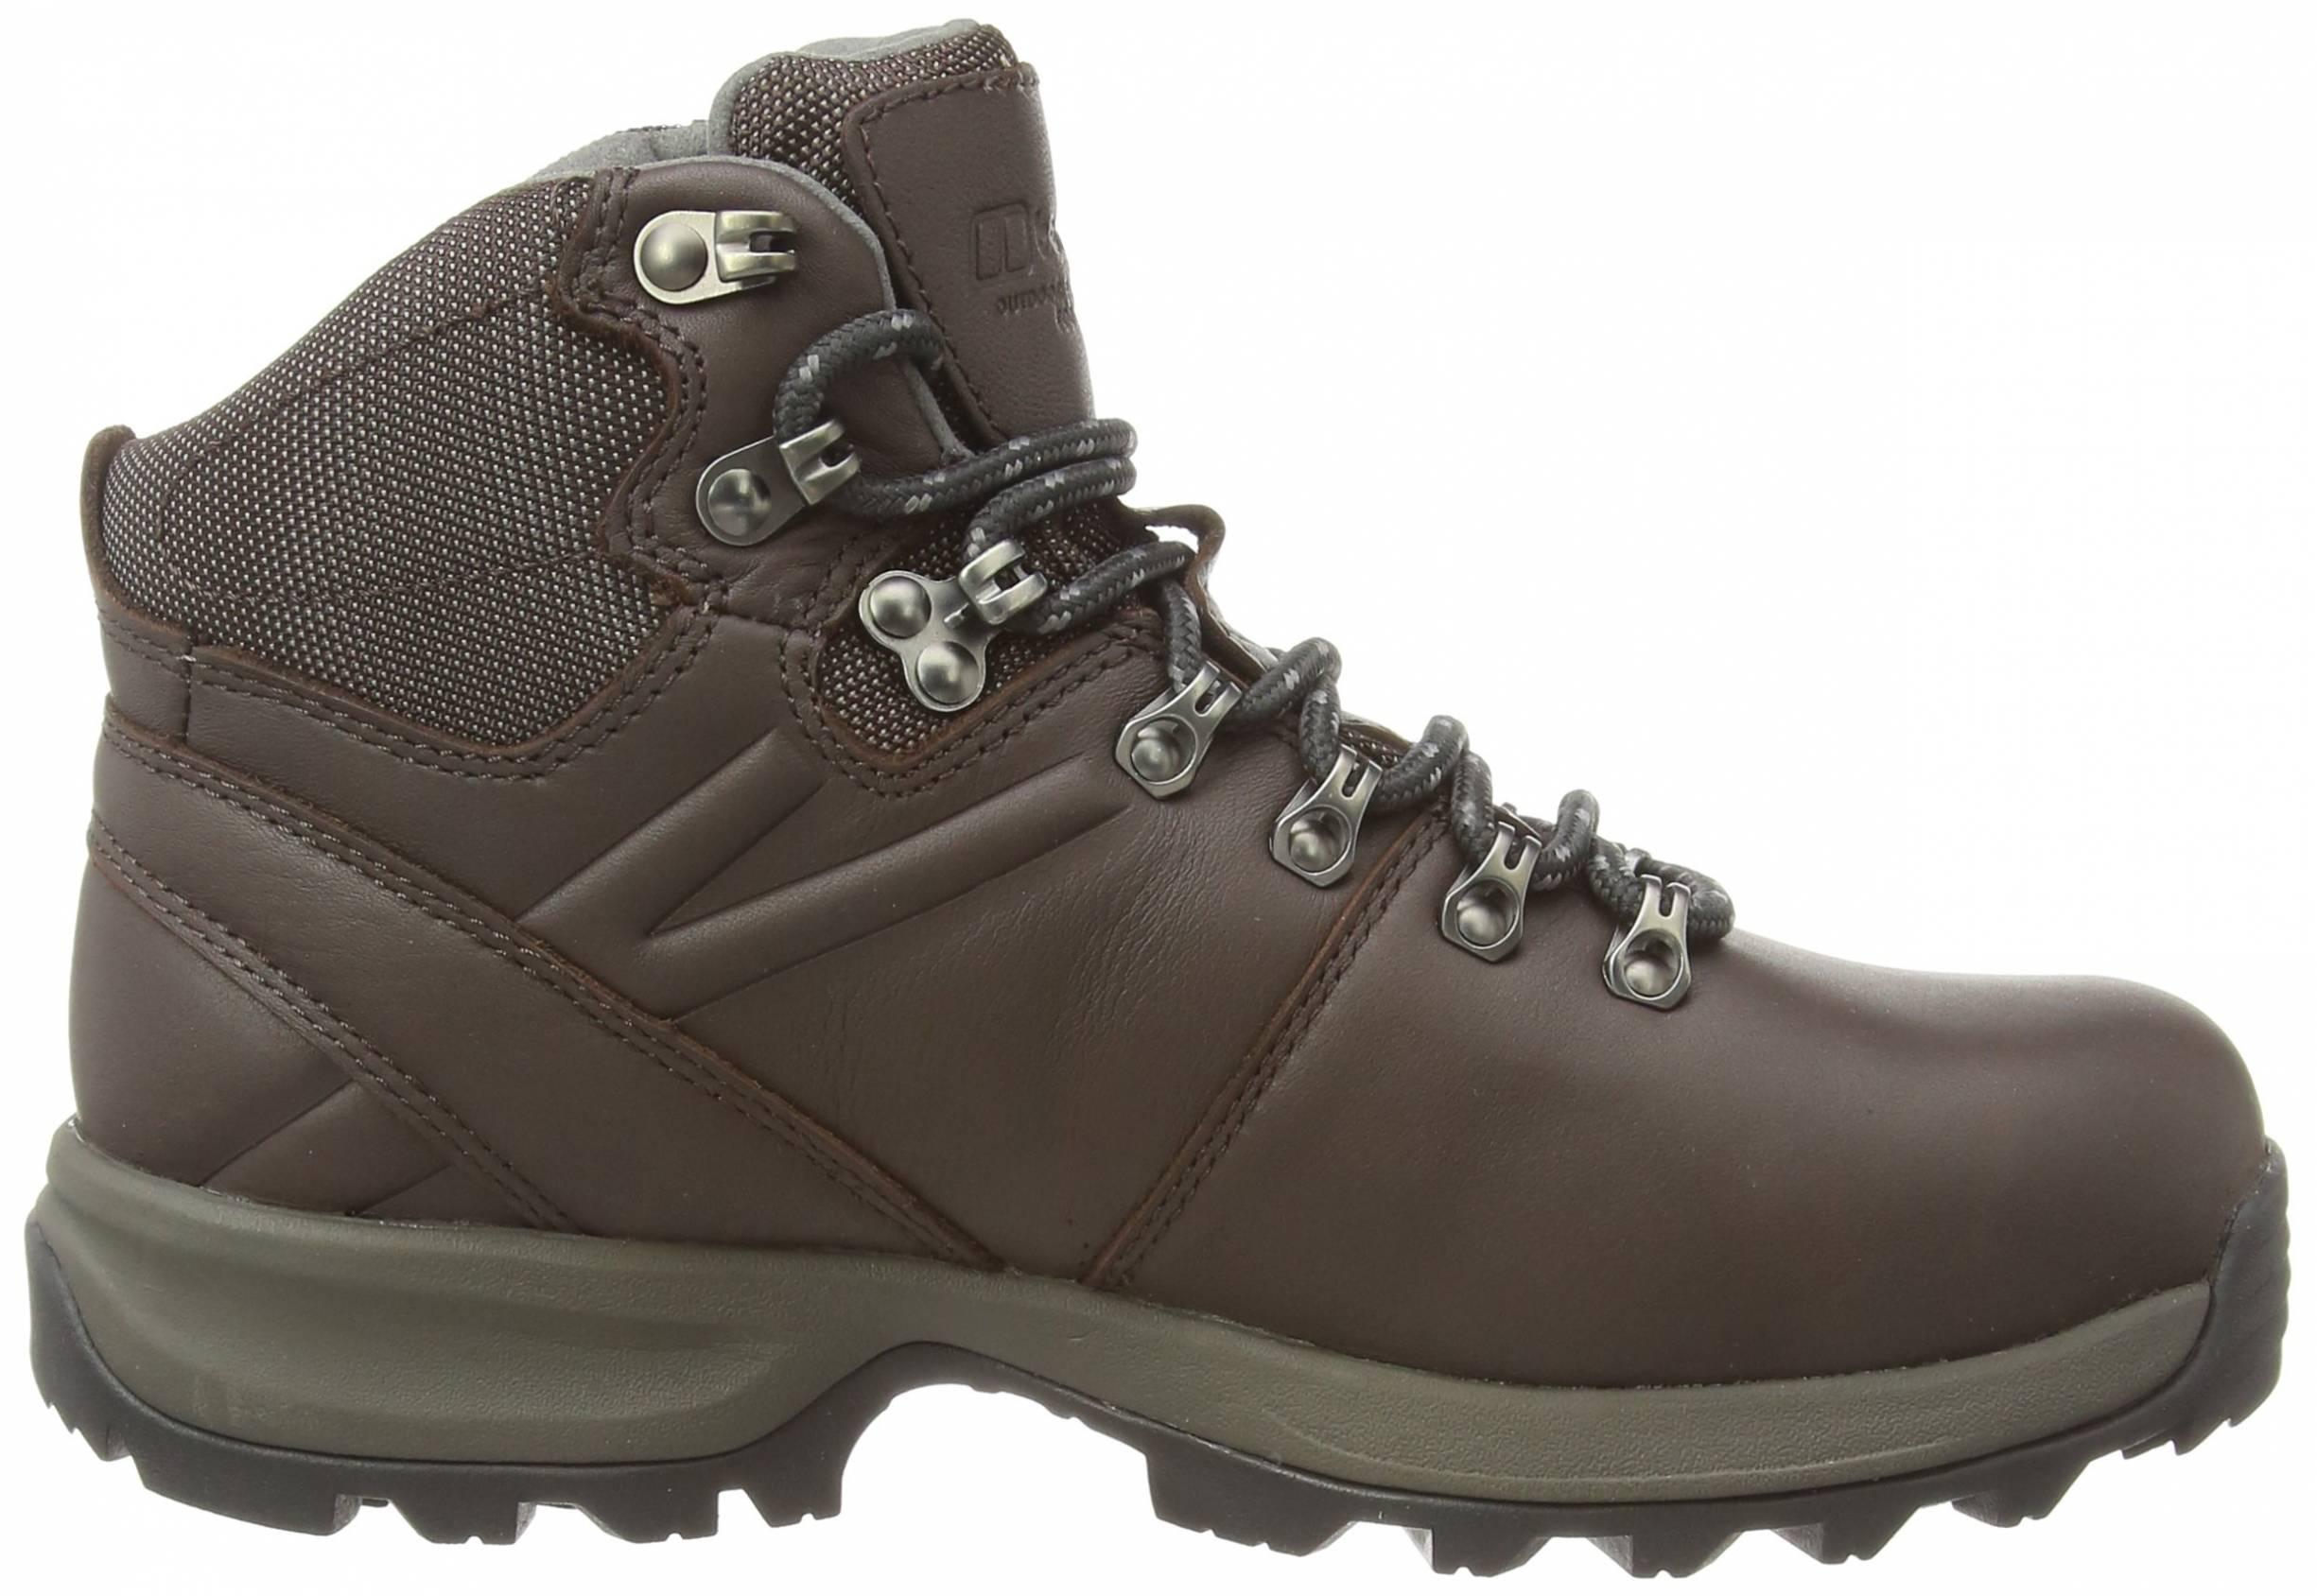 berghaus hiking boots sale